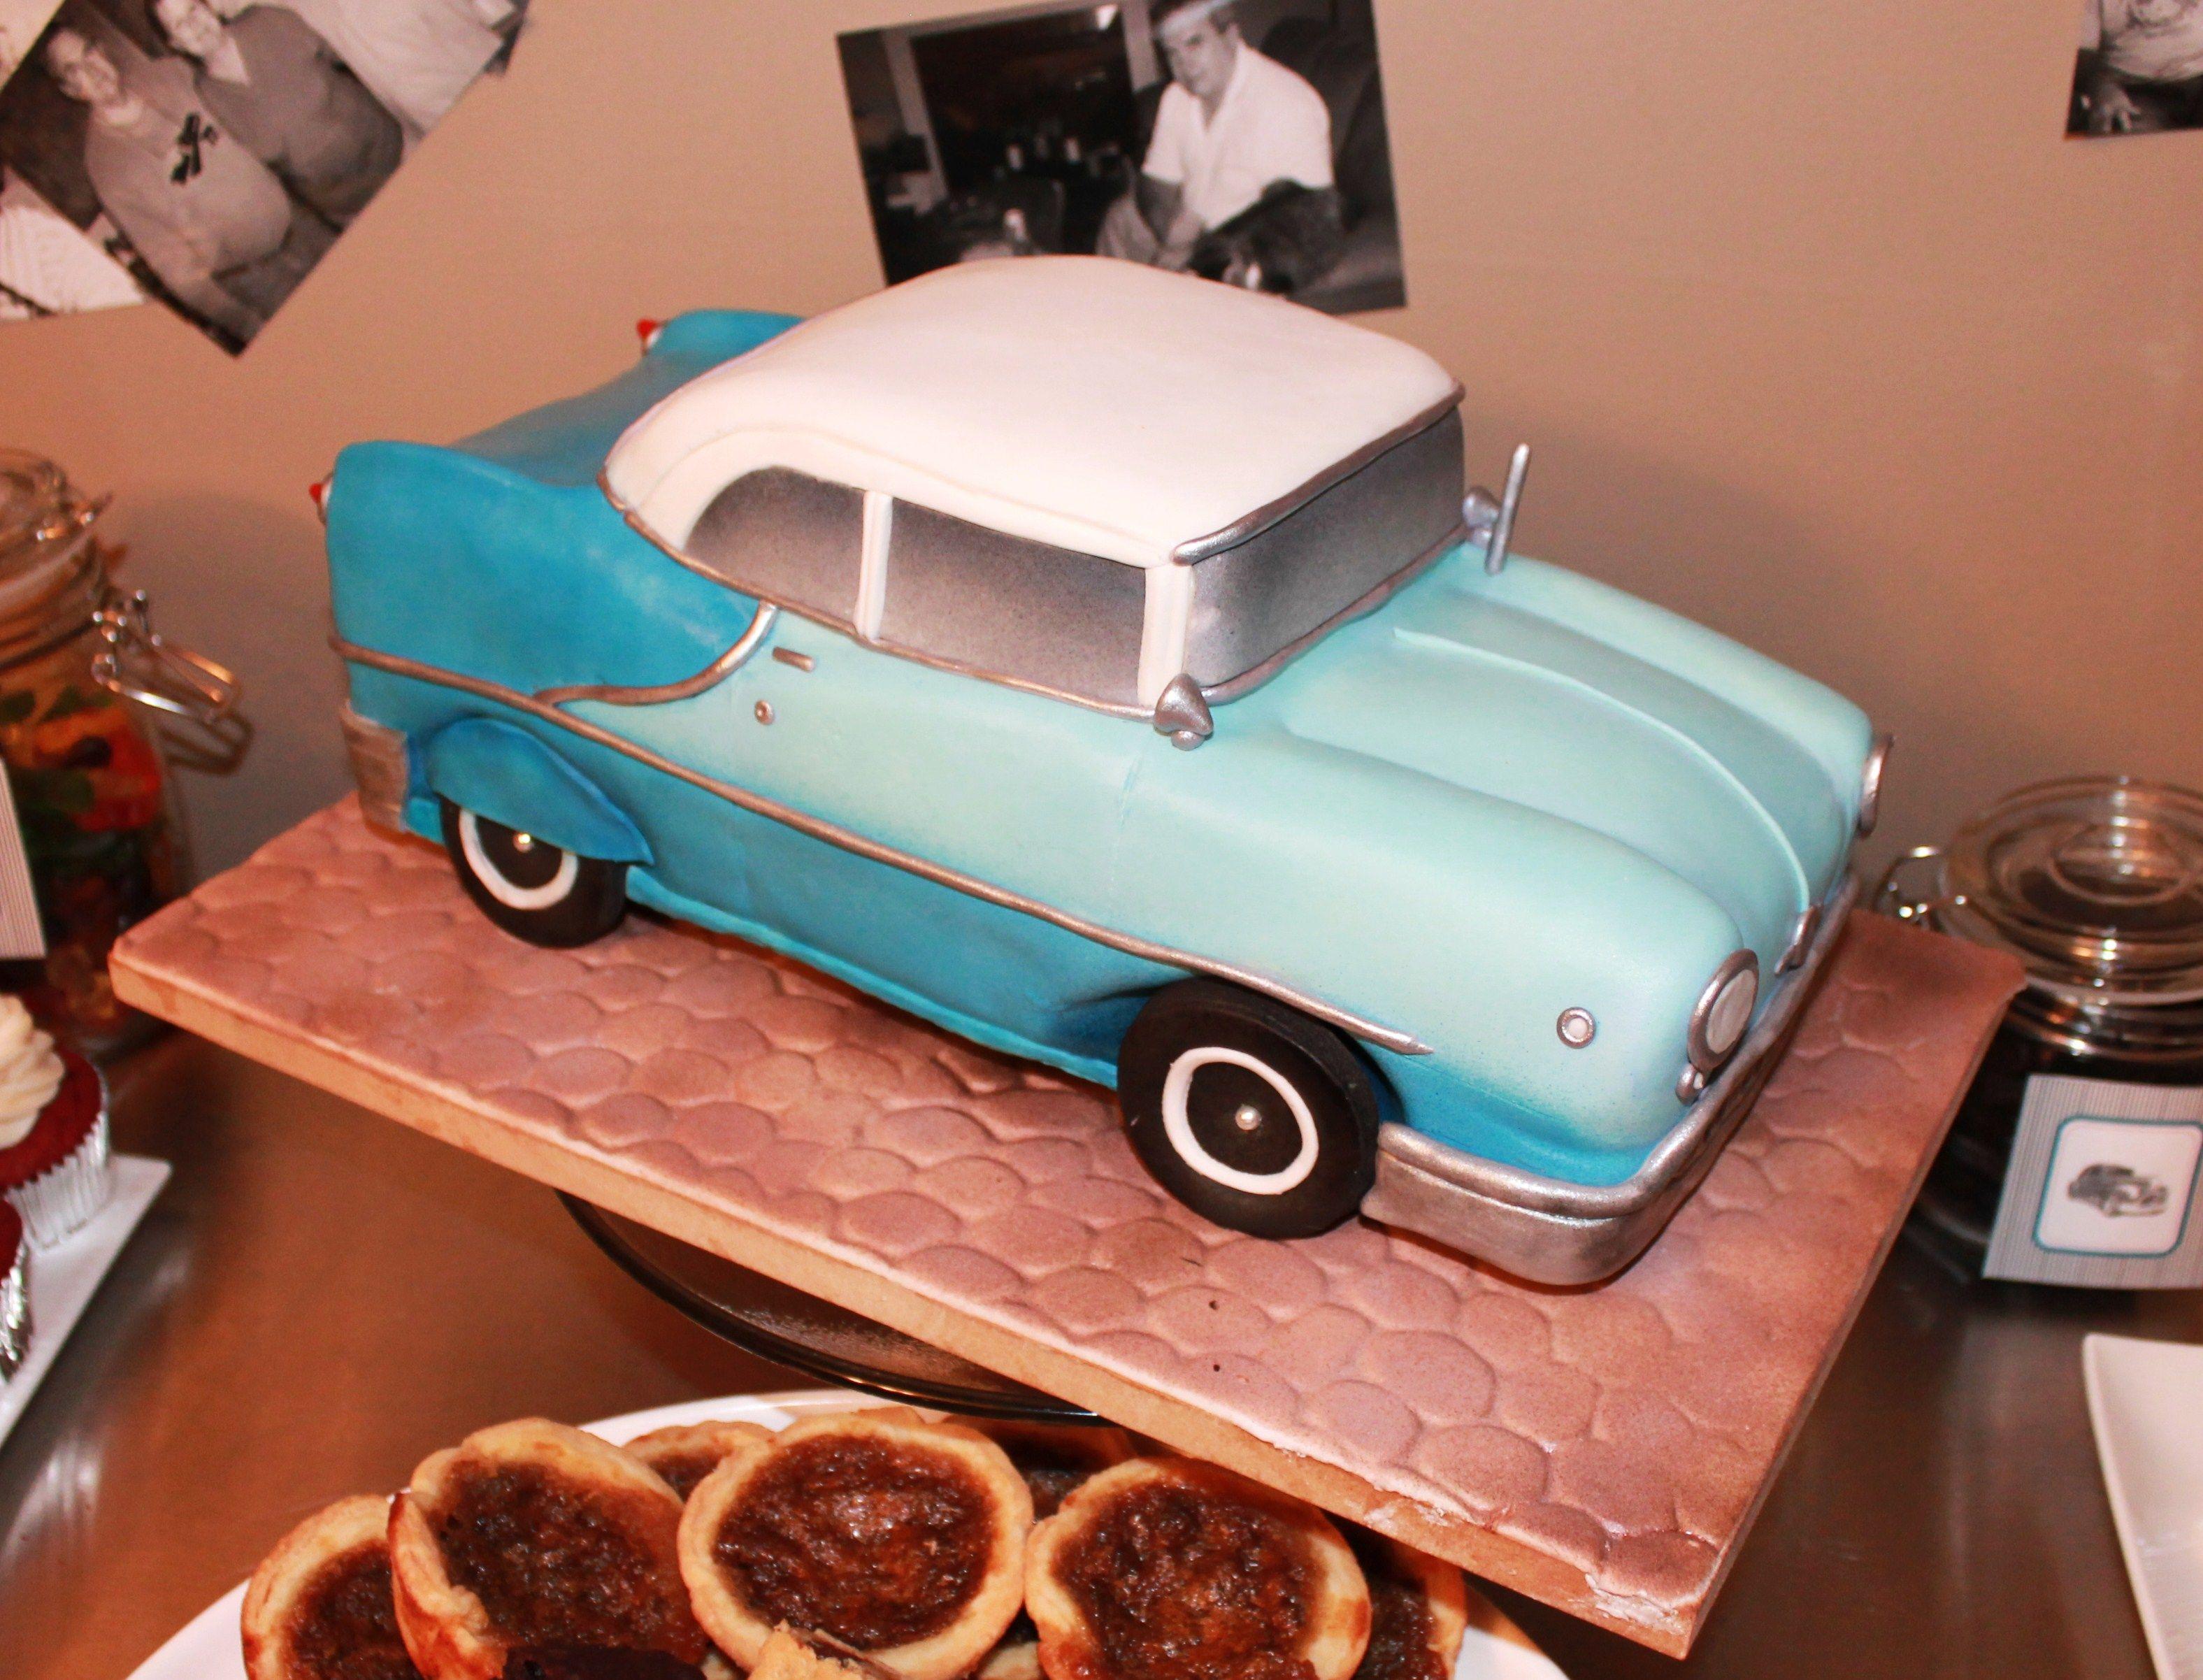 Replica Vintage Car Cake Www Facebook Com Sugspicecakes Cakes